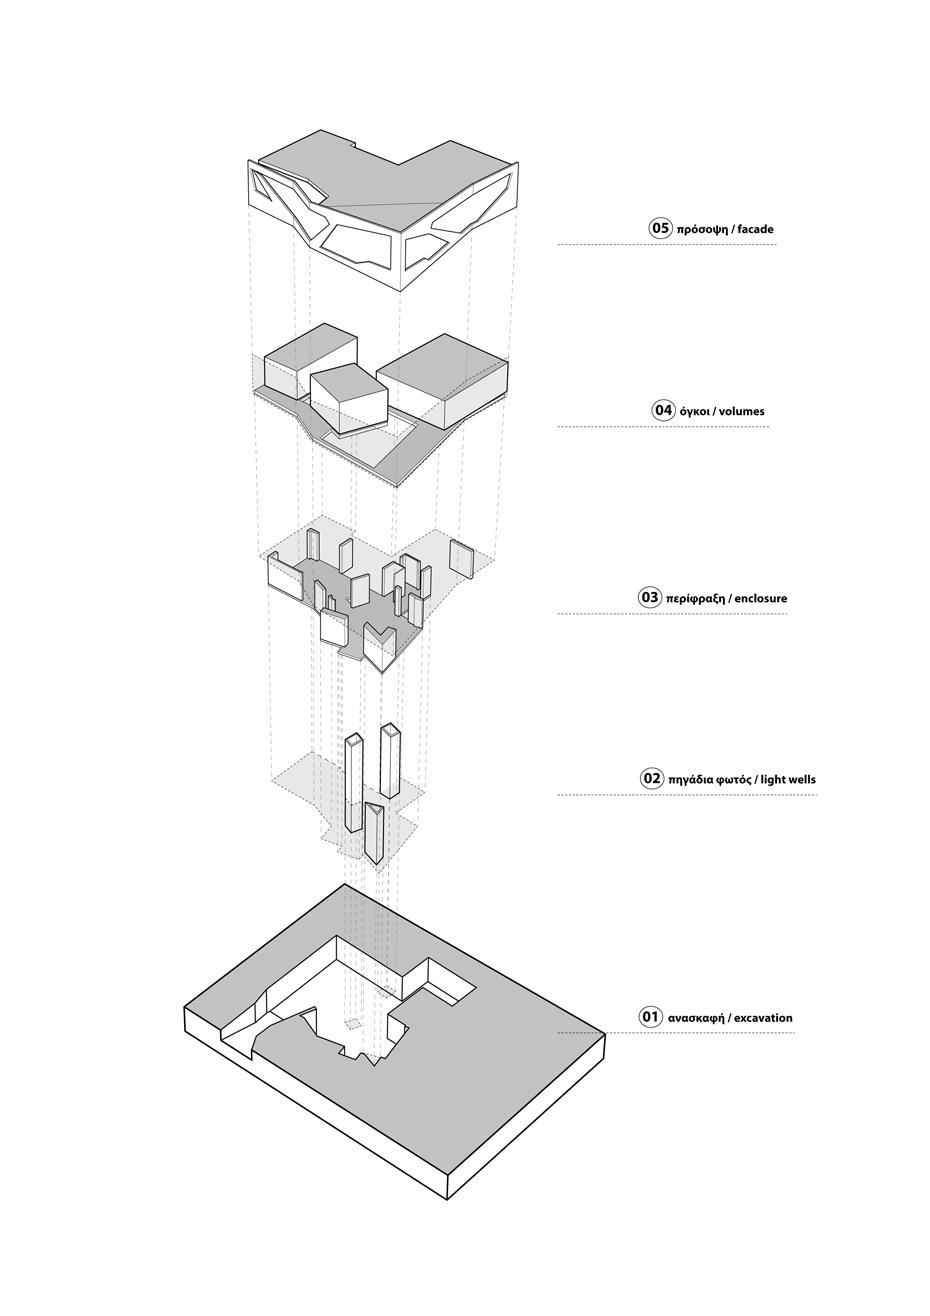 Sias-Blog-Klab-Paradox-House-14